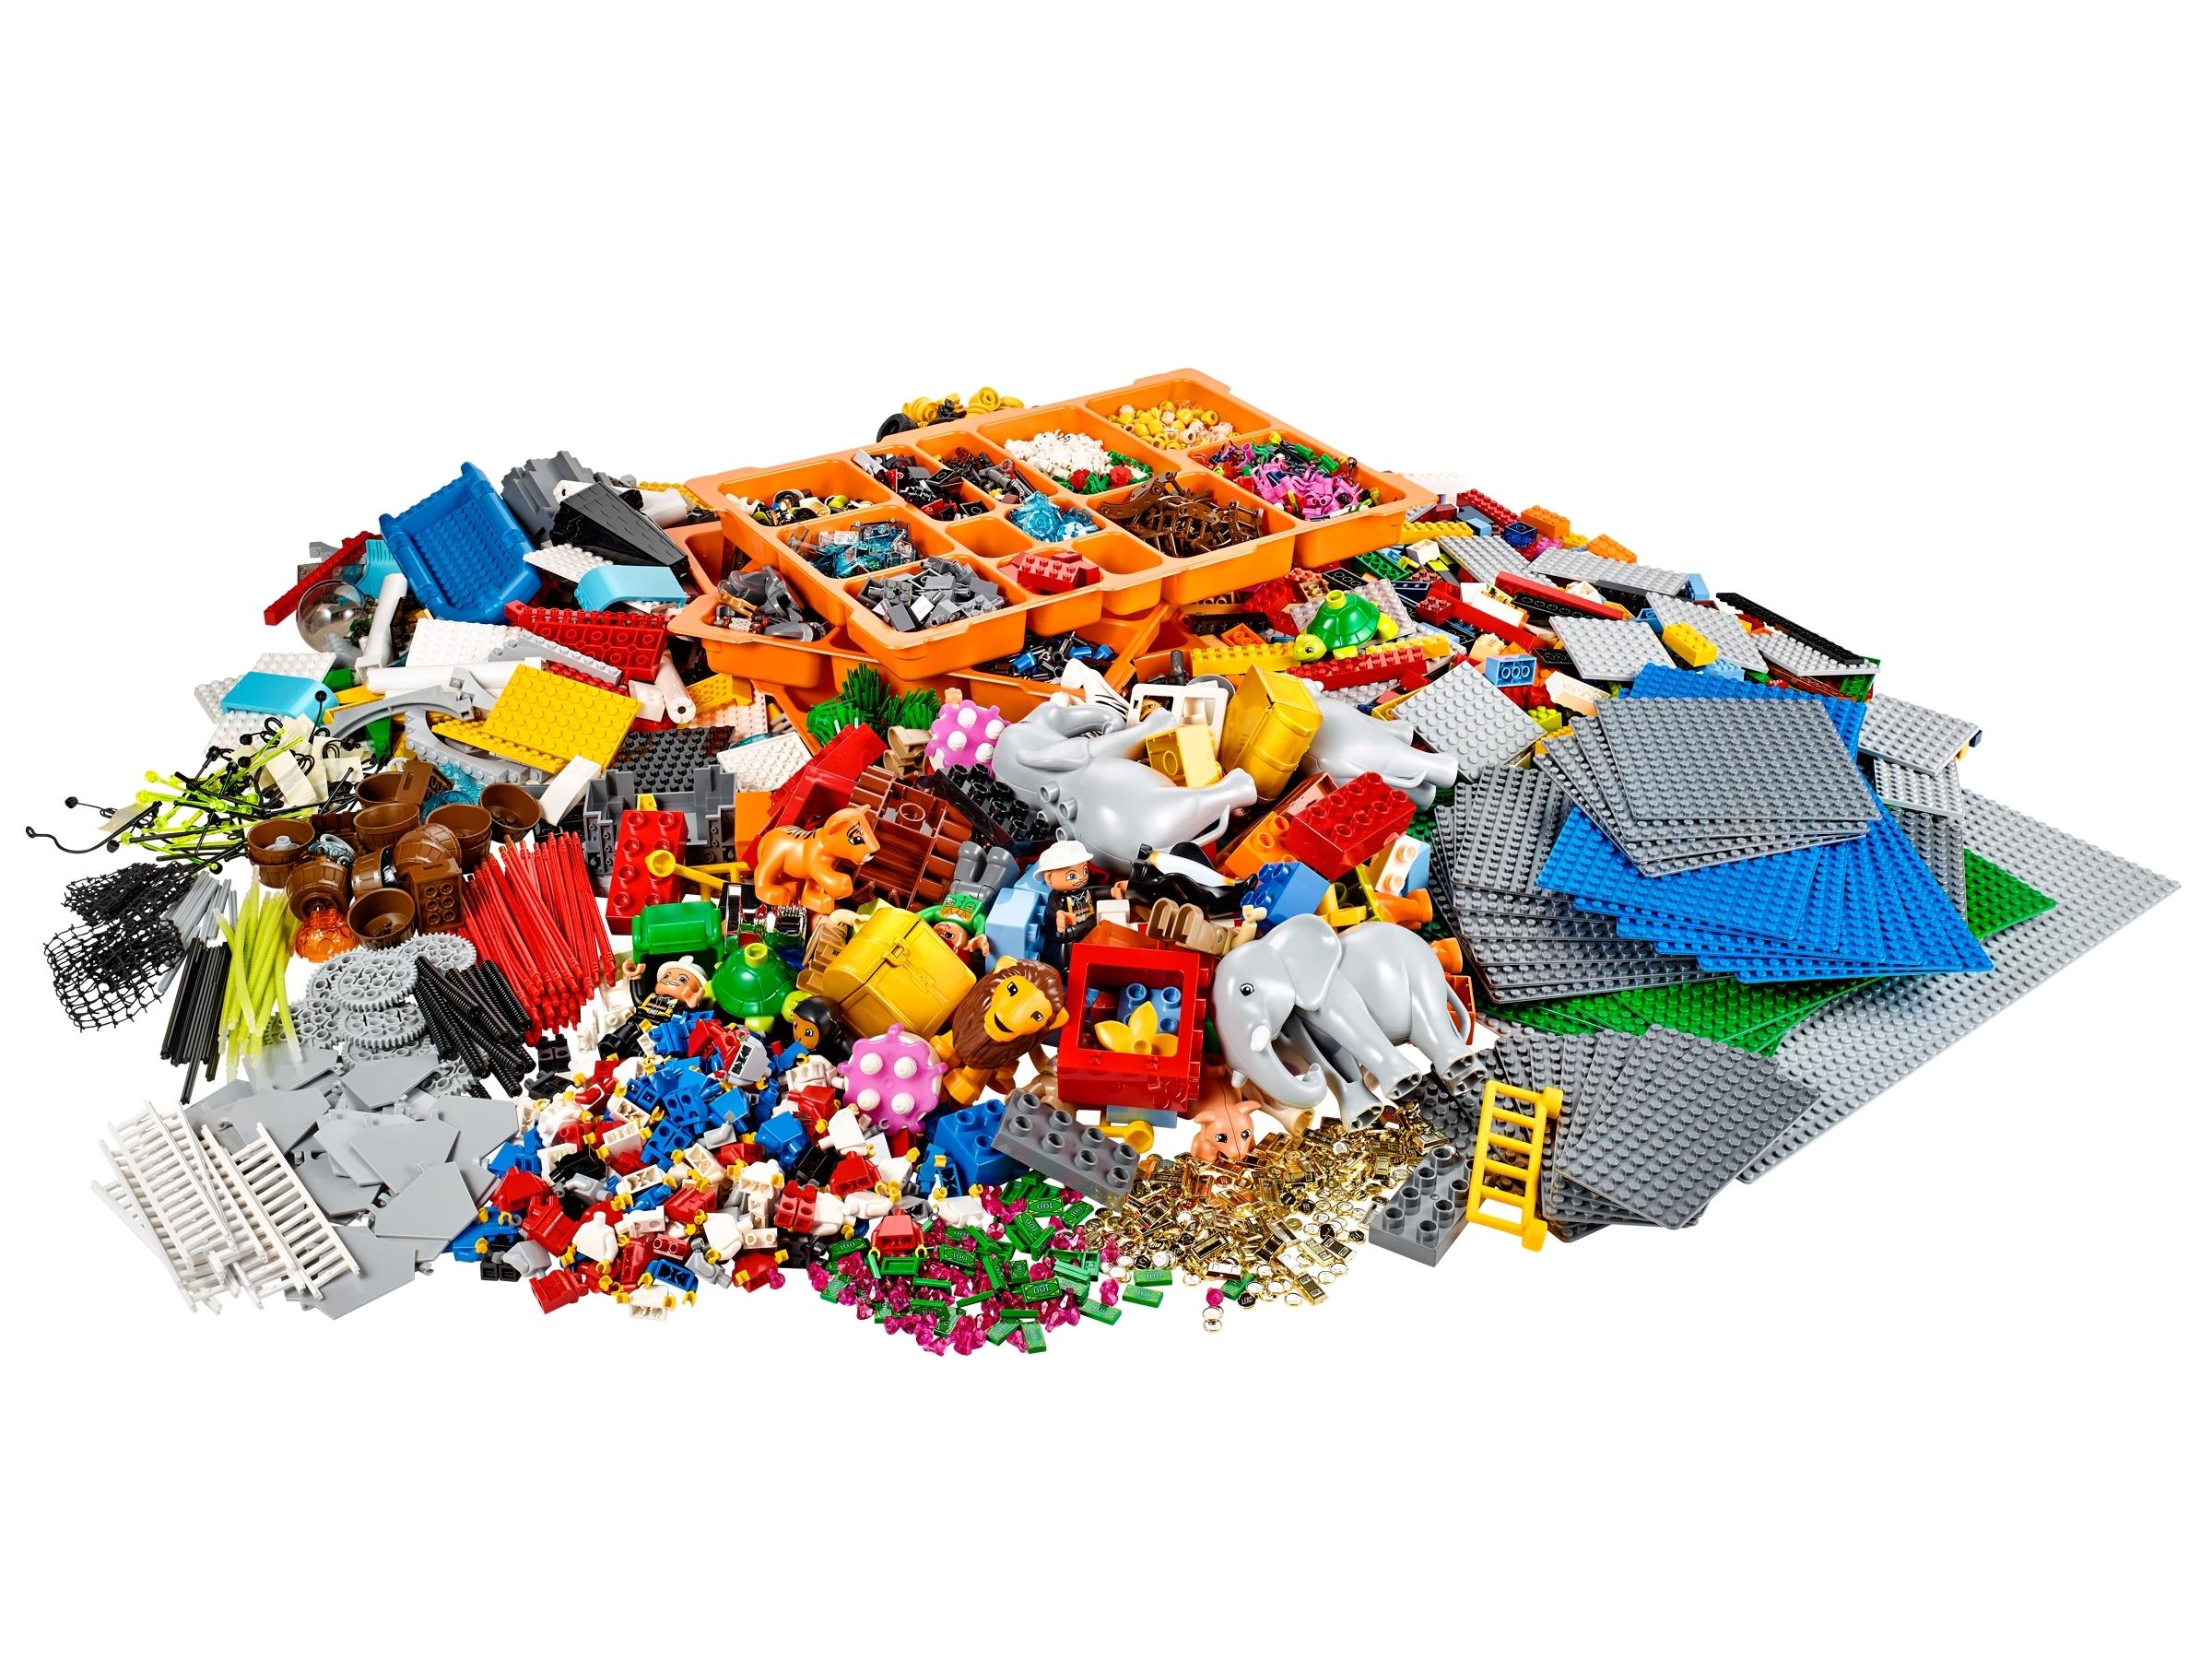 2000430 offisielle lego 2000430 shop no